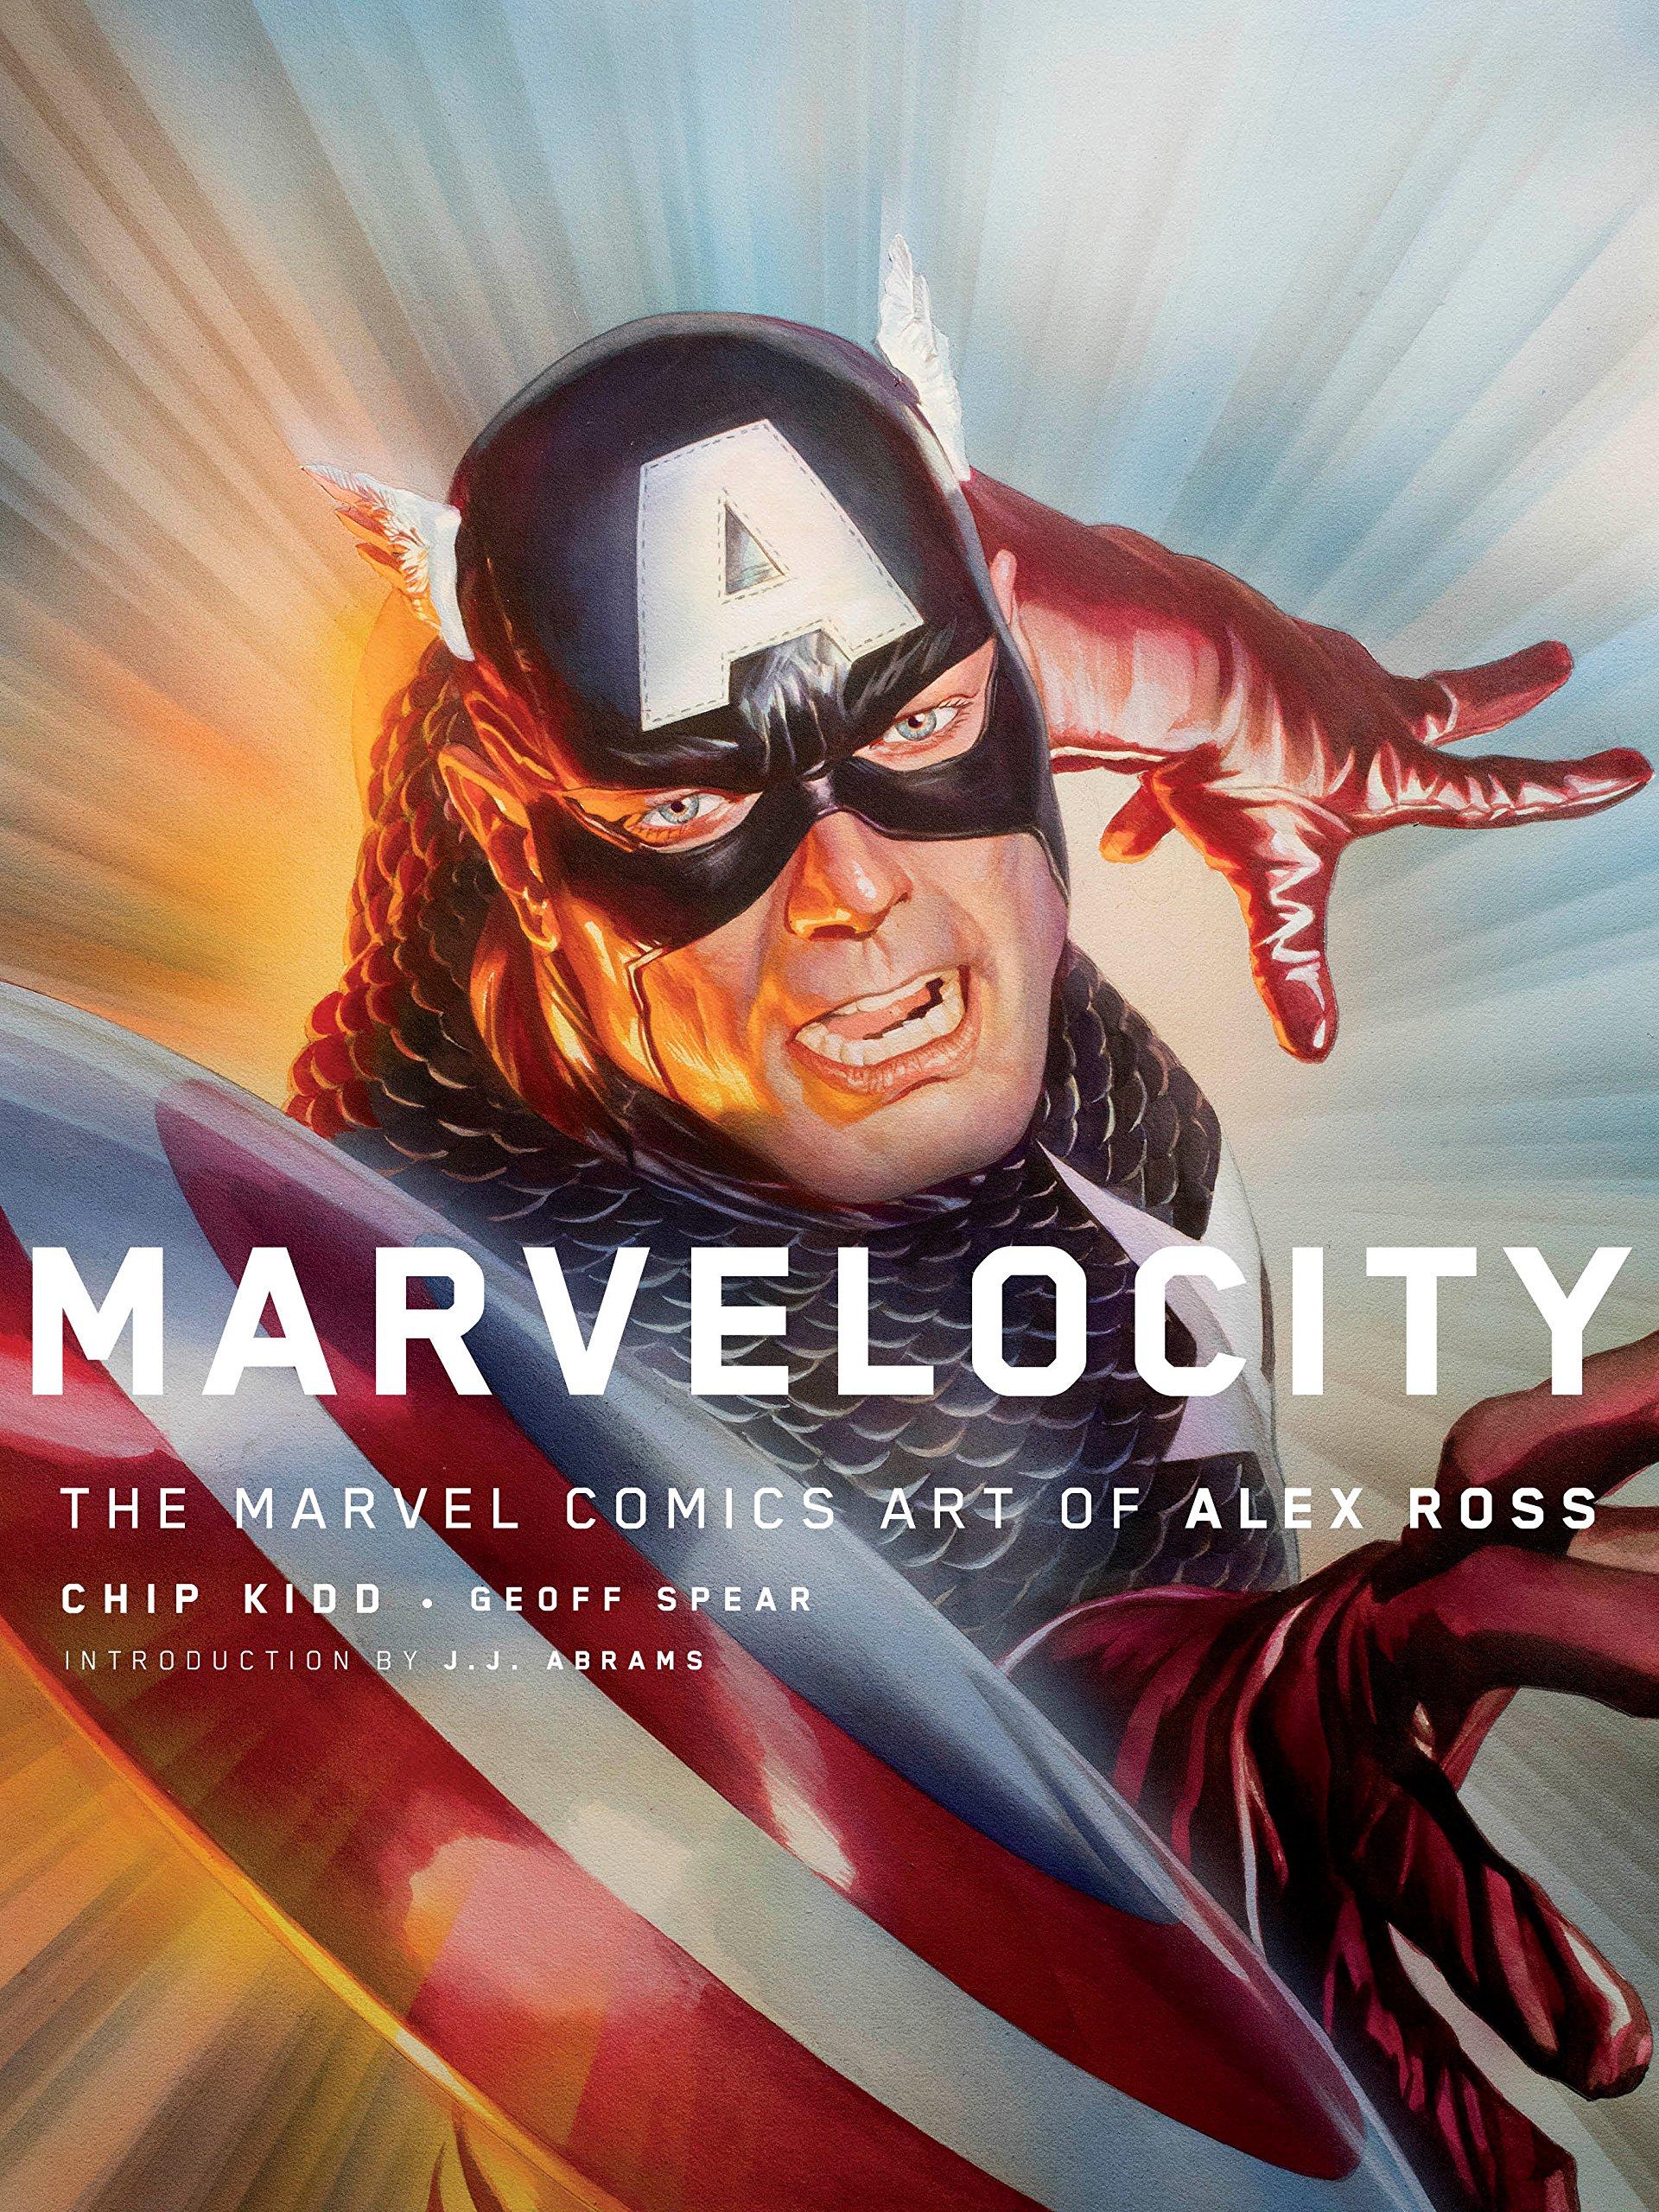 Marvelocity The Marvel Comics Art of Alex Ross Review